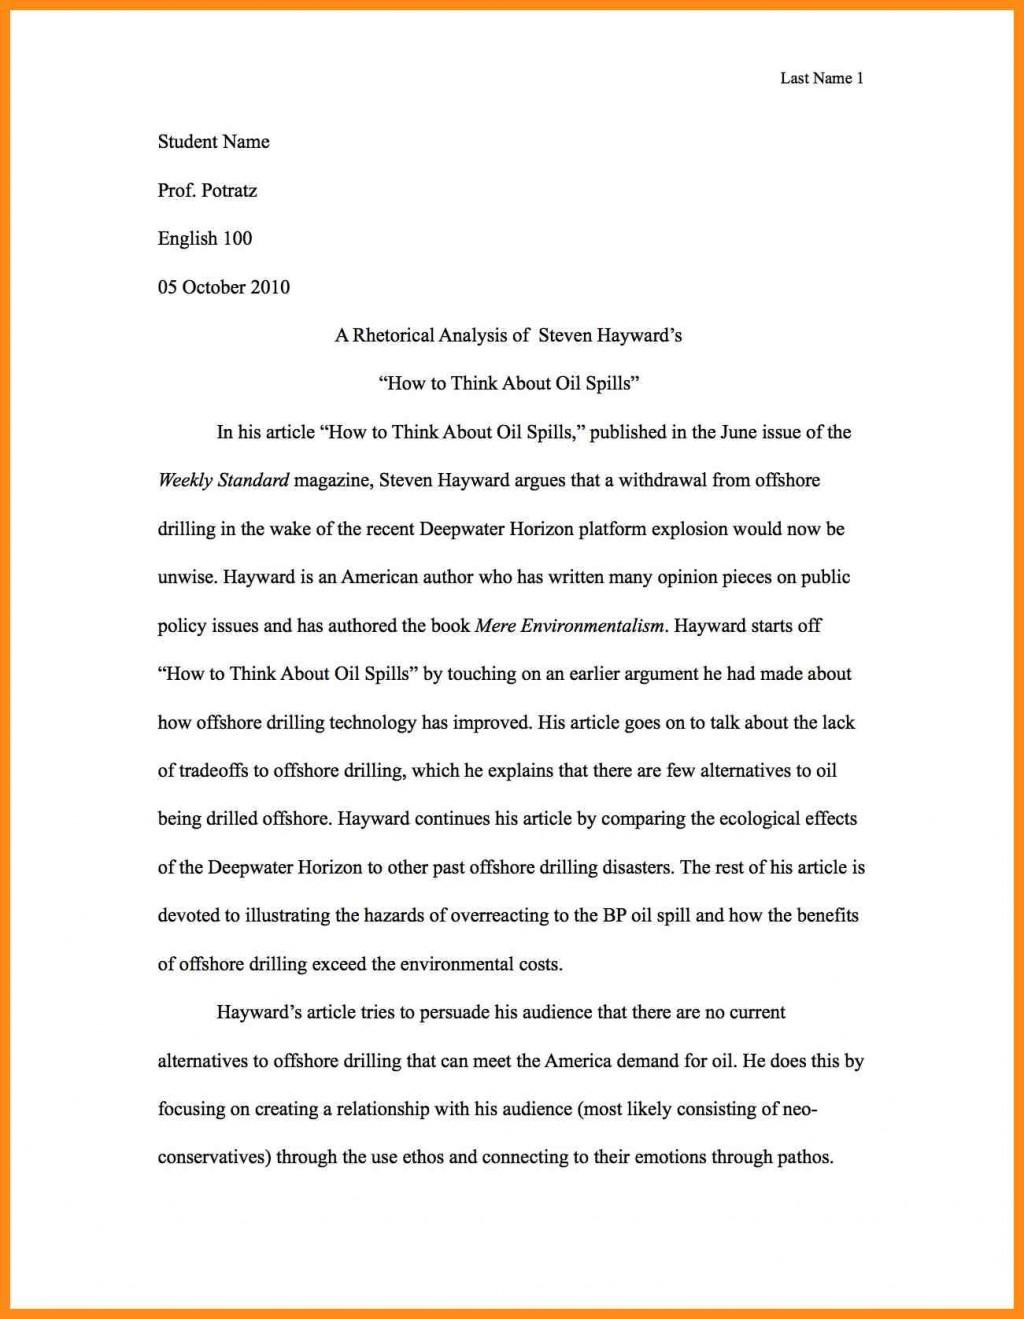 002 Write Best Rhetorical Analysis Essay Example Of Using Ethos Pathos And Logos Impressive Ap Lang 2016 Devices Examples English Large